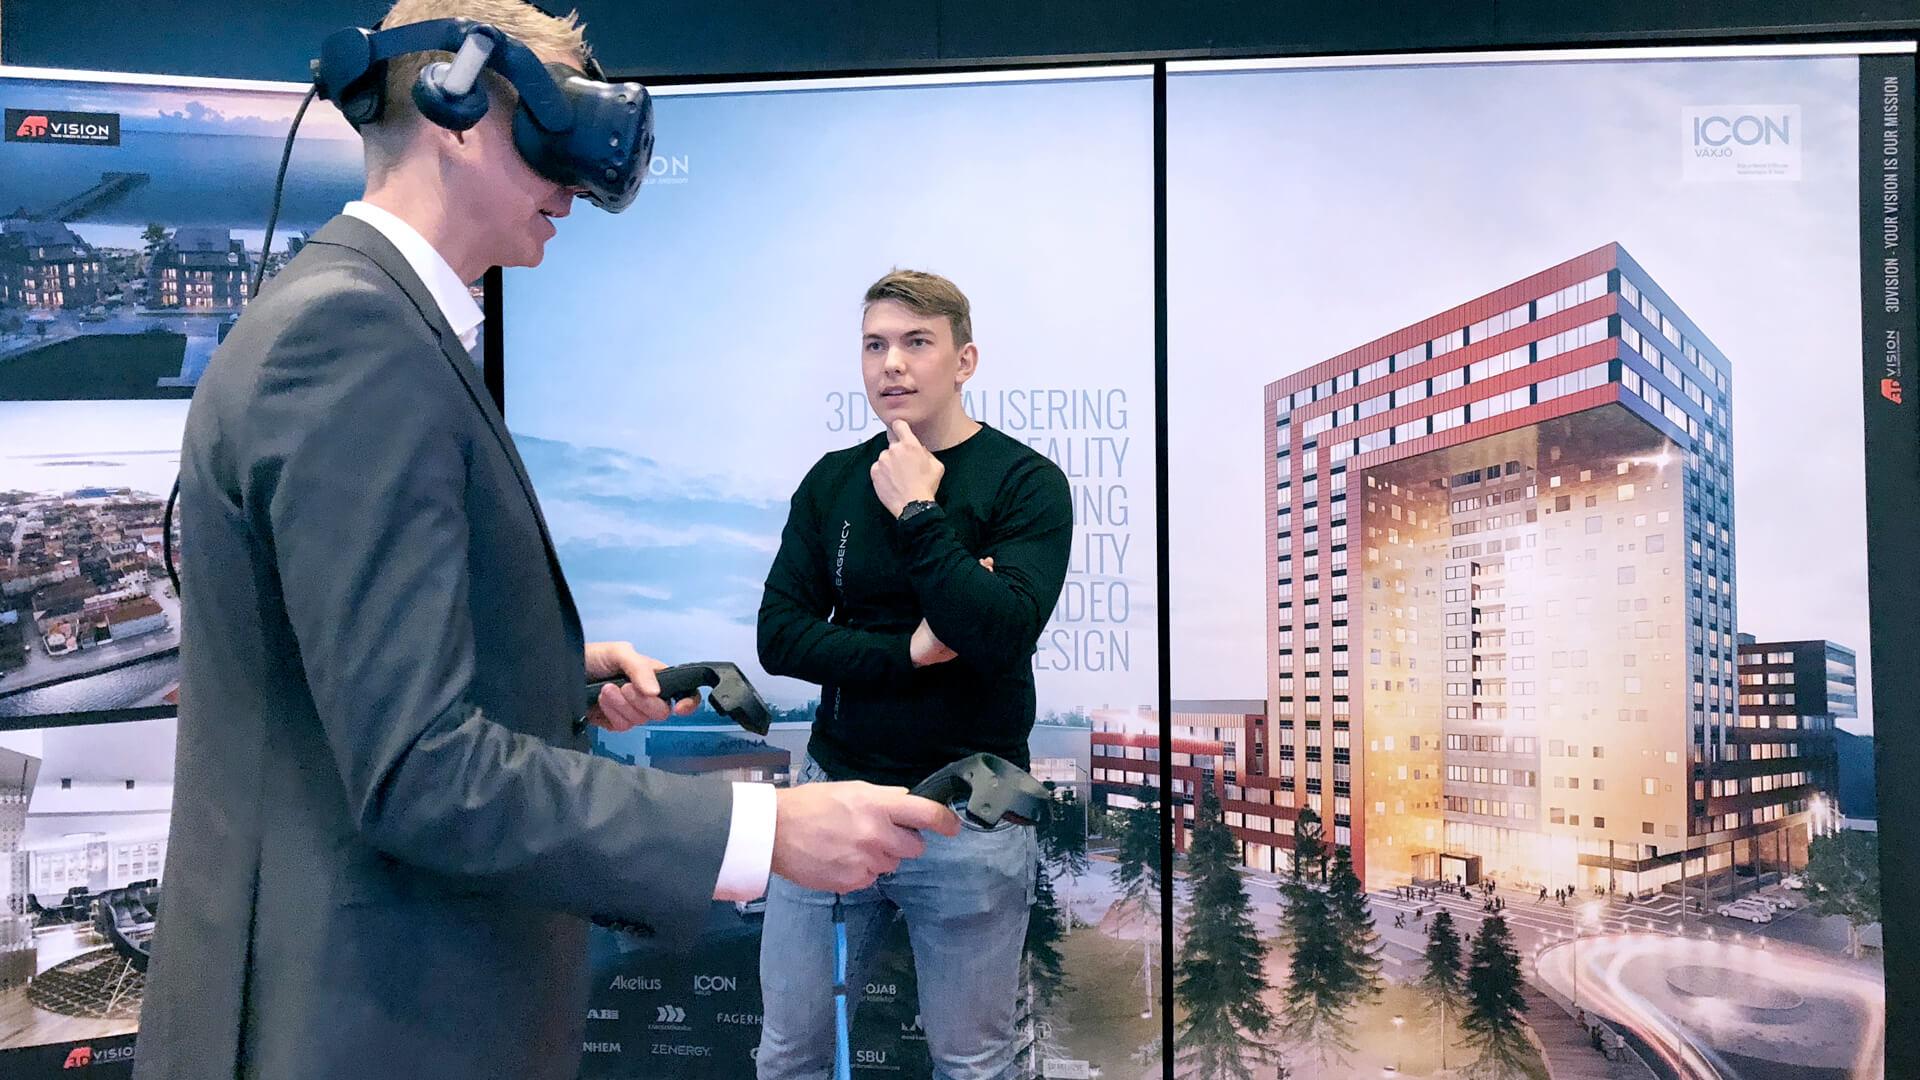 Virtuell verklighet blev snackis